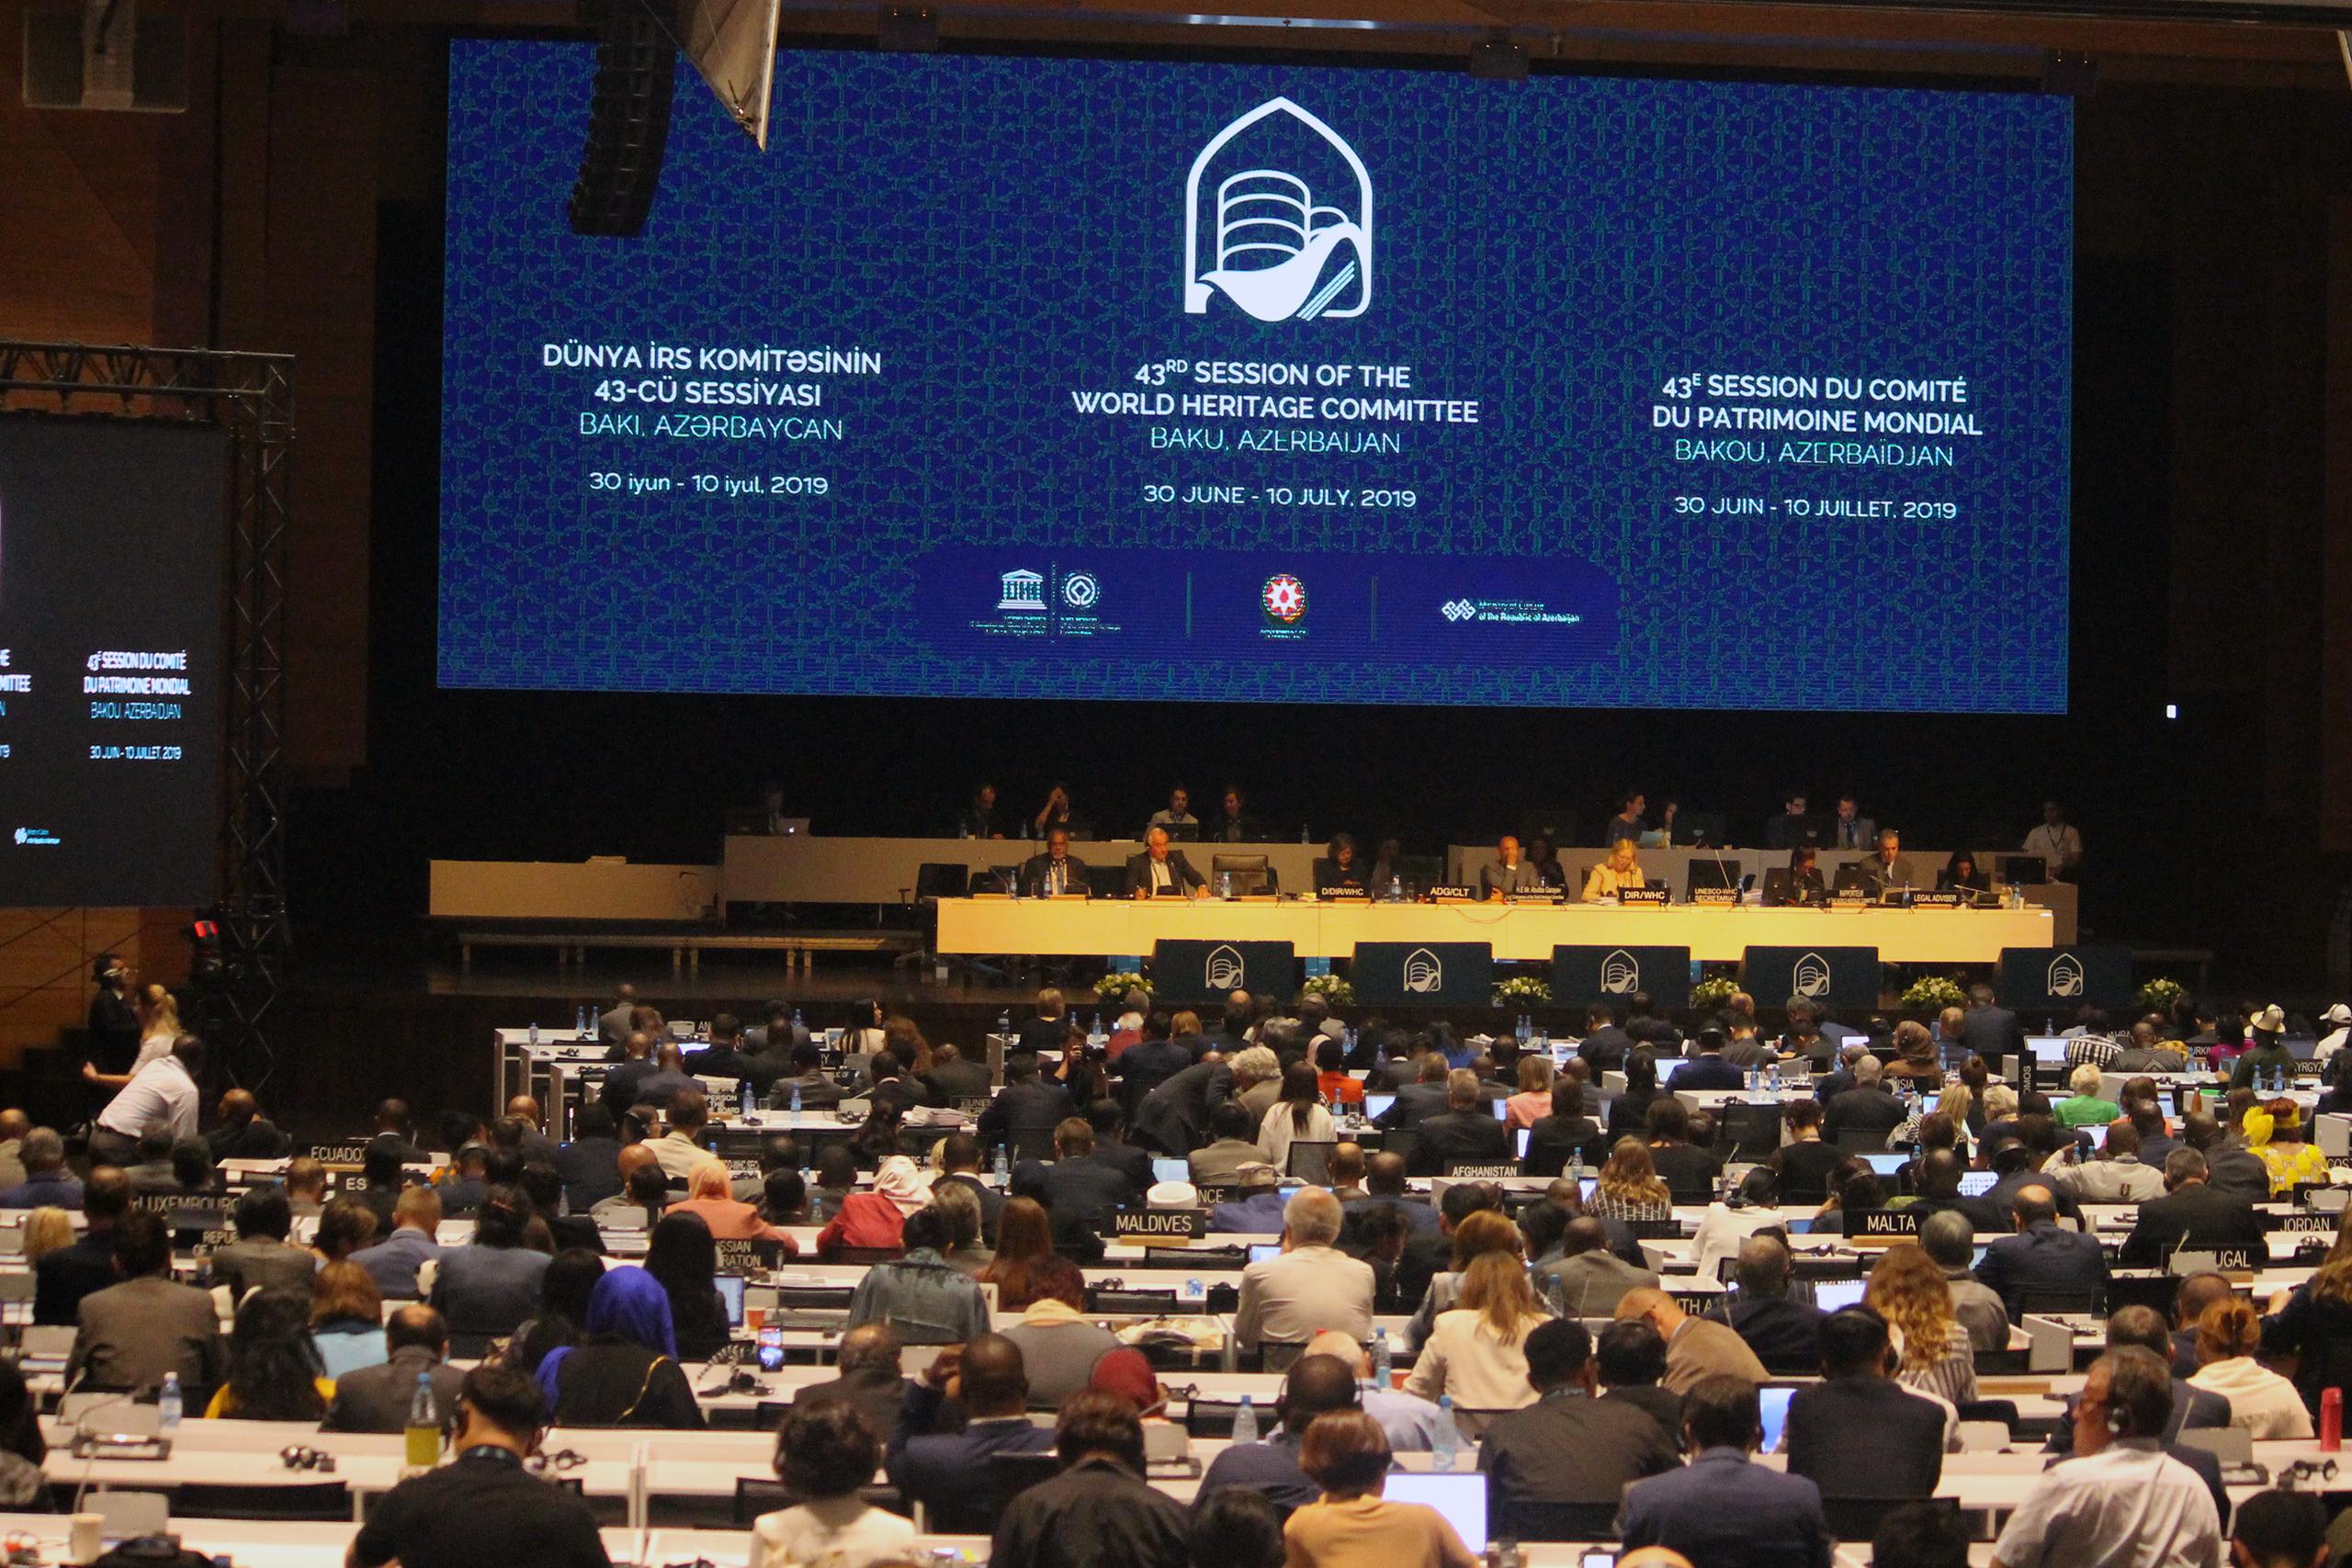 43 sesja UNESCO w Baku